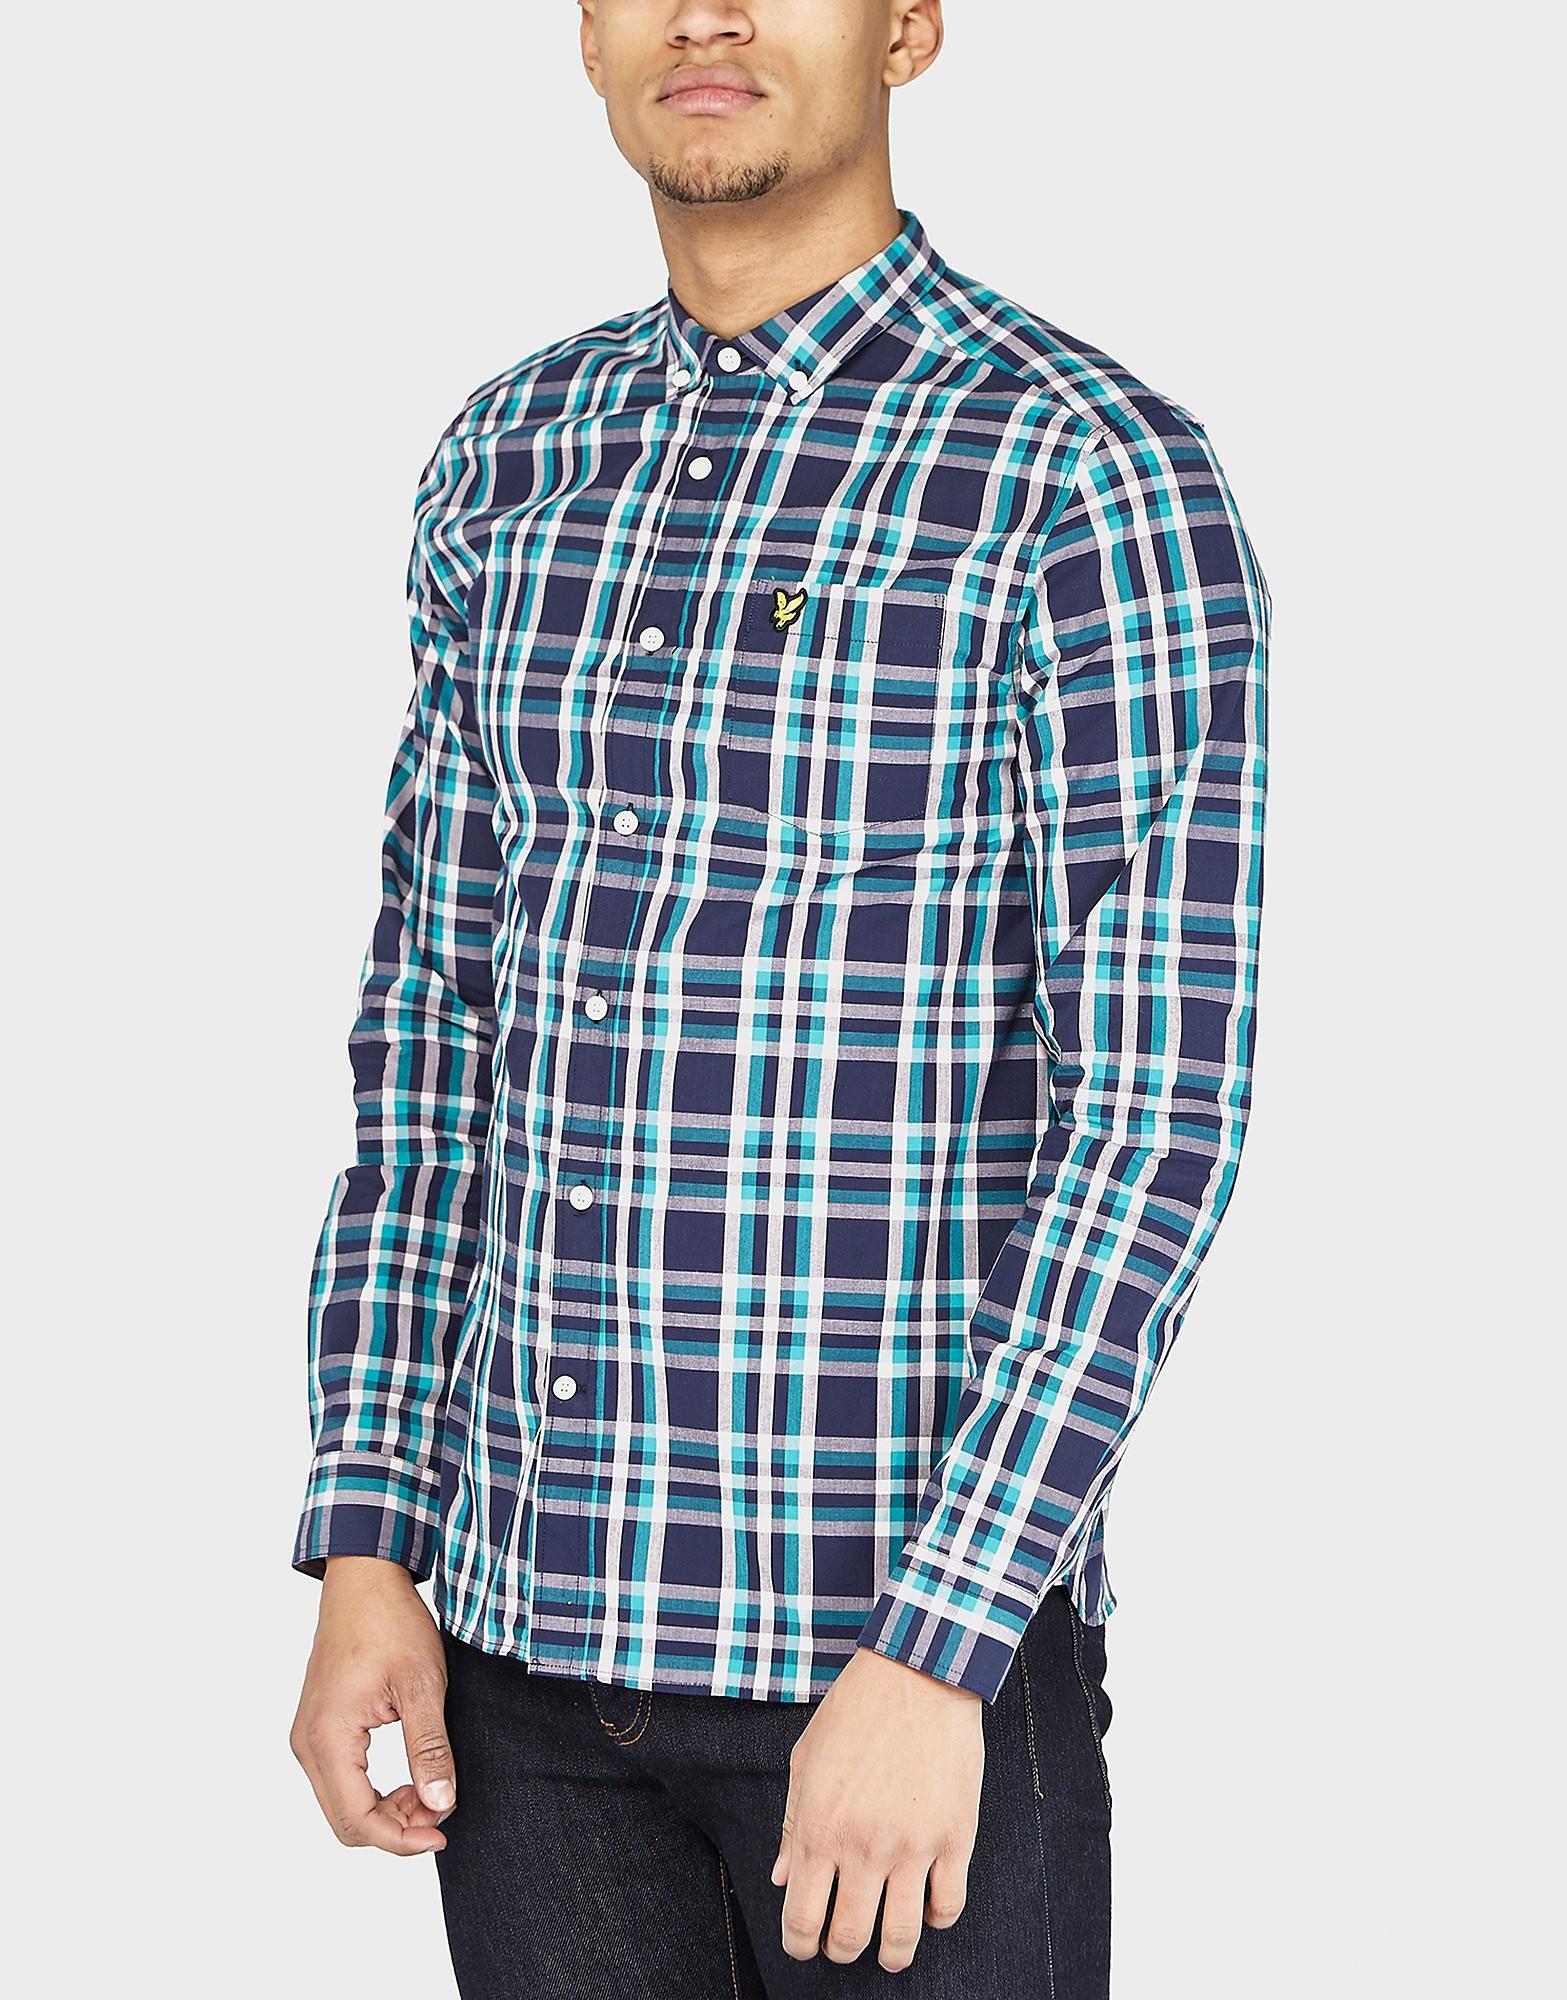 Lyle & Scott Multi Check Shirt